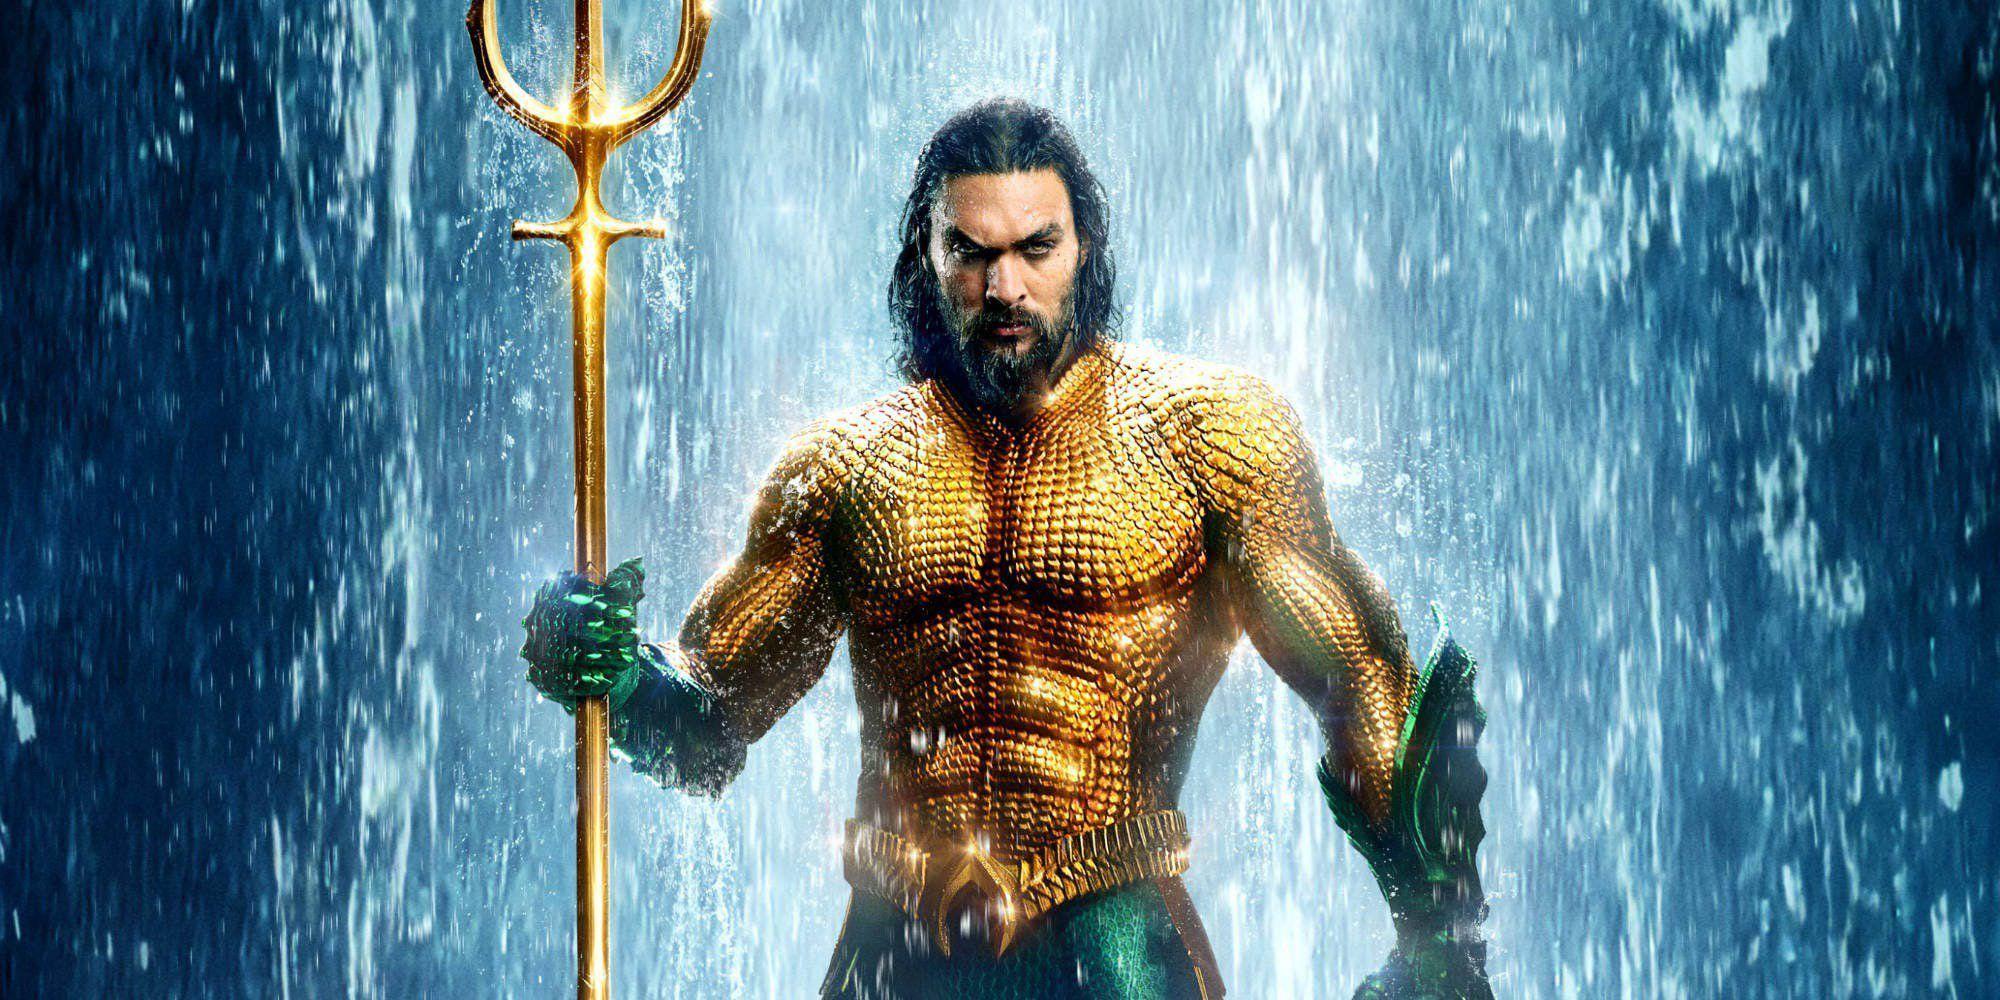 Aquaman Primeras Impresiones Aquaman Crítica